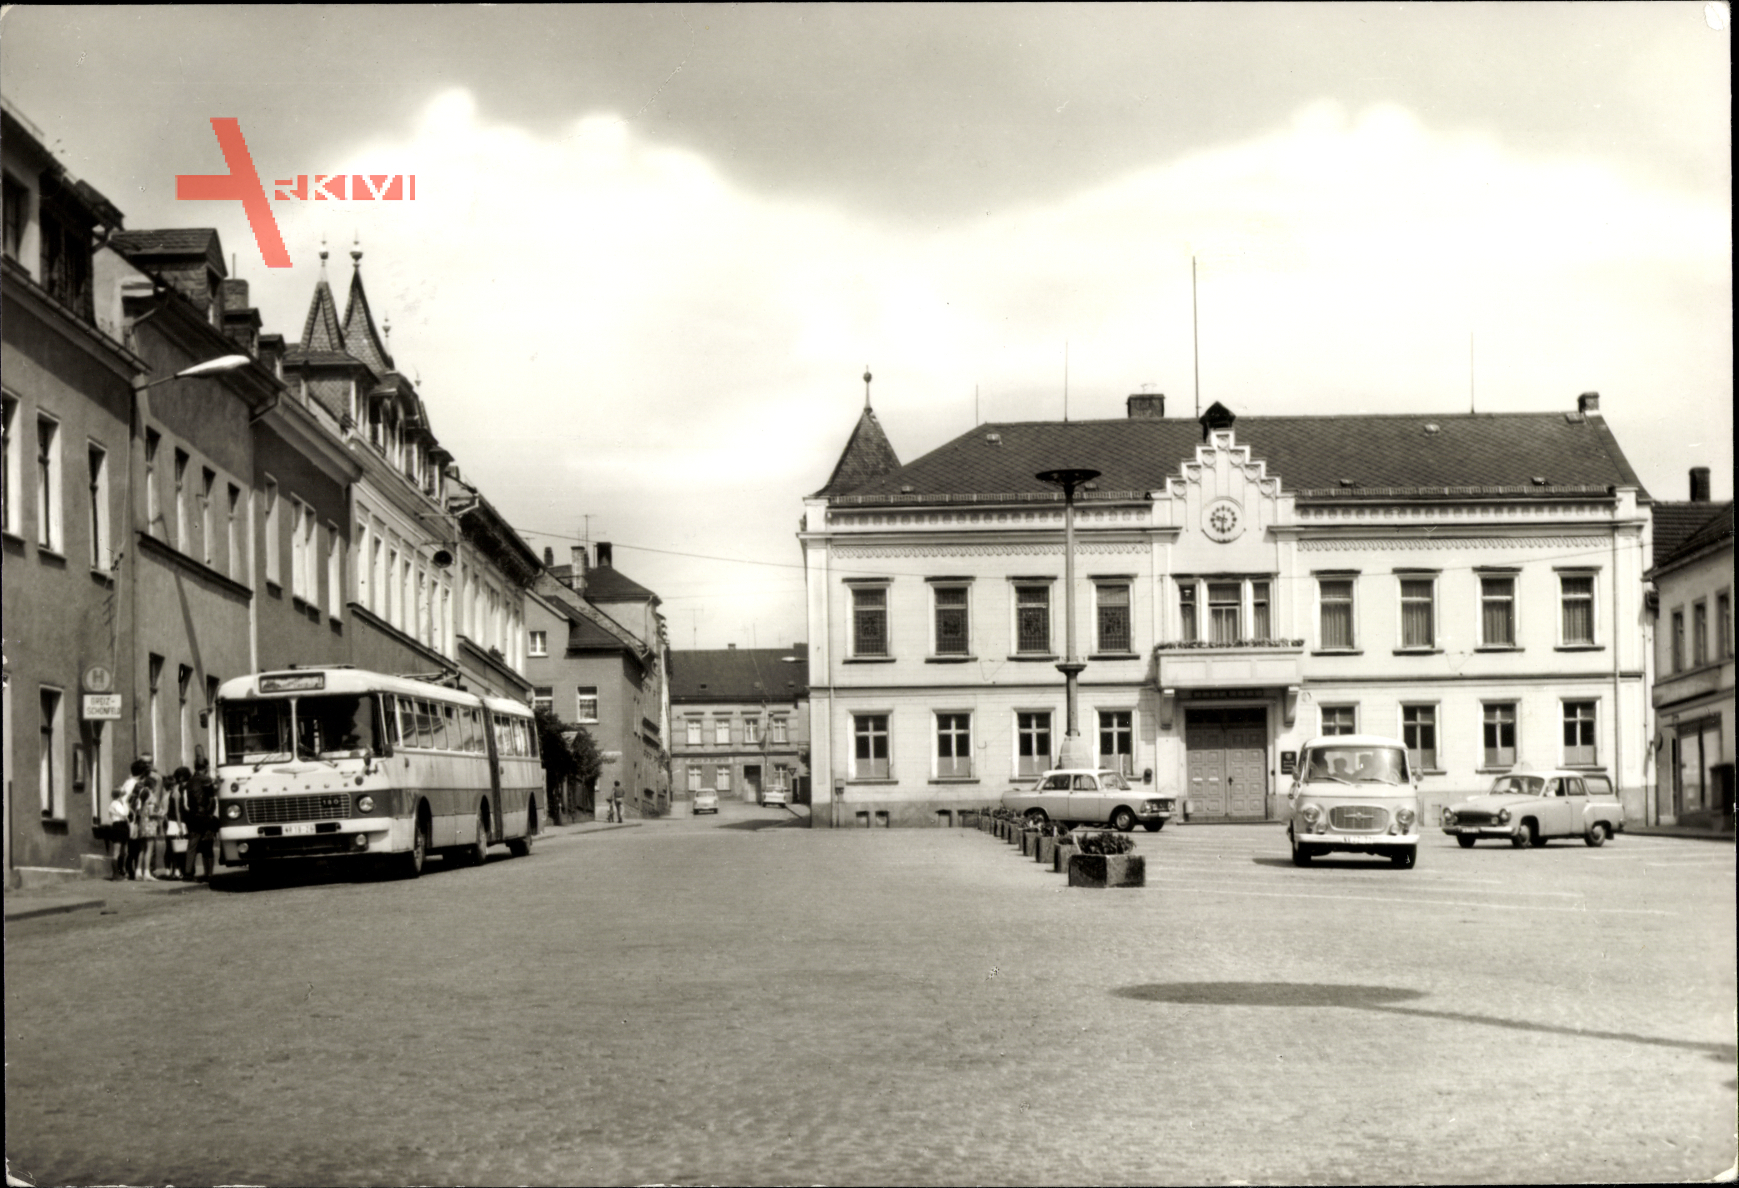 Elsterberg im Vogtland, Markt, Bus an der Haltestelle, Rathaus